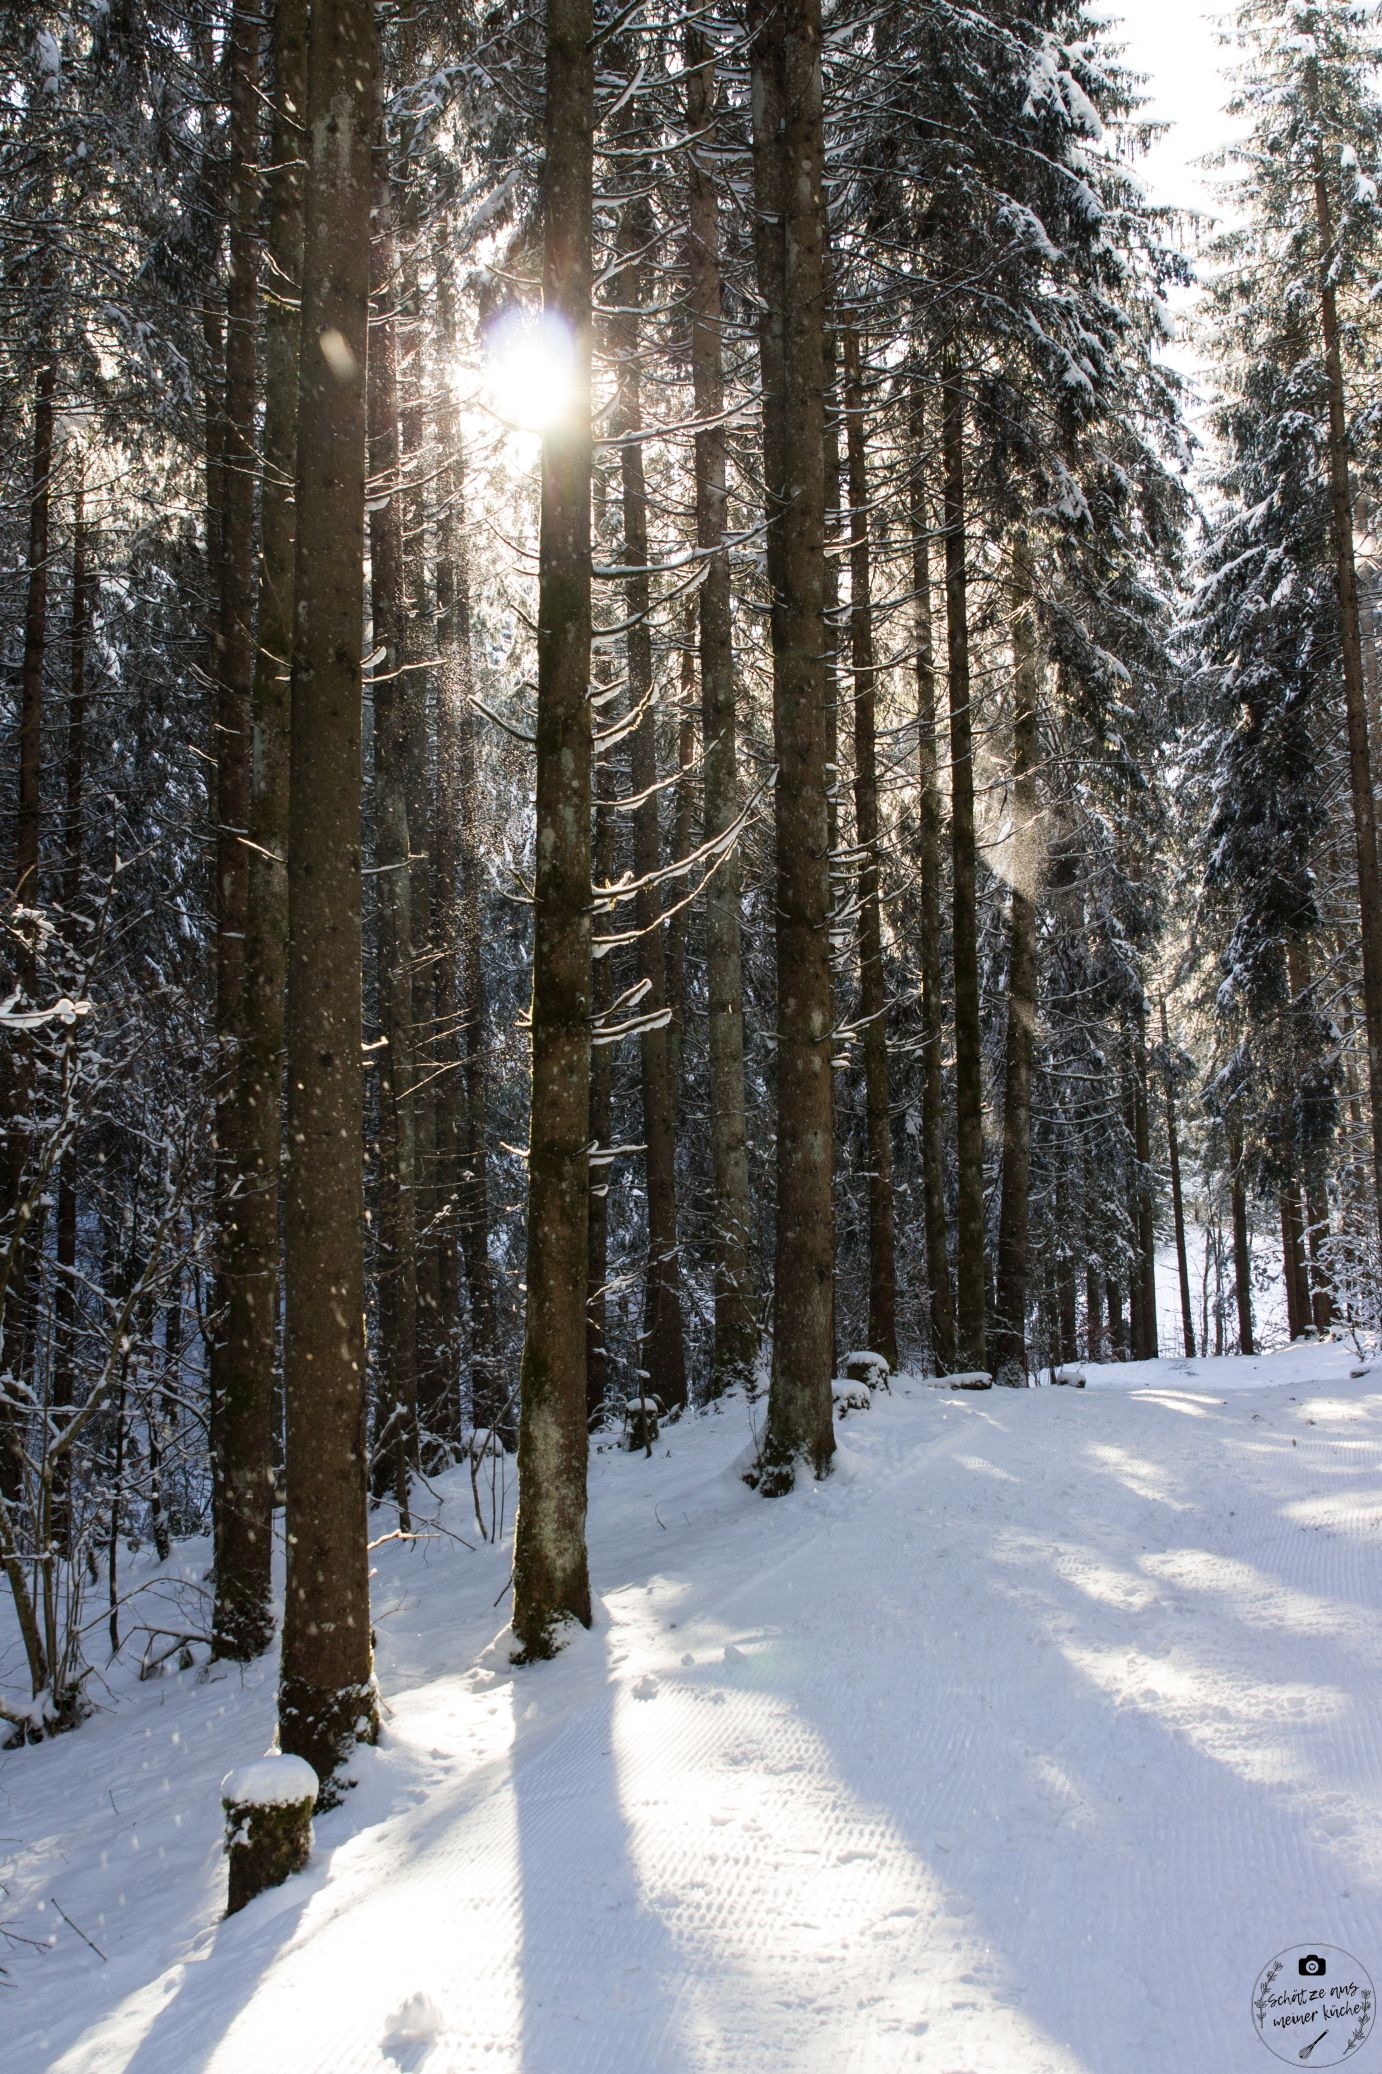 Haubers Naturresort Waldspaziergang Klimapfad